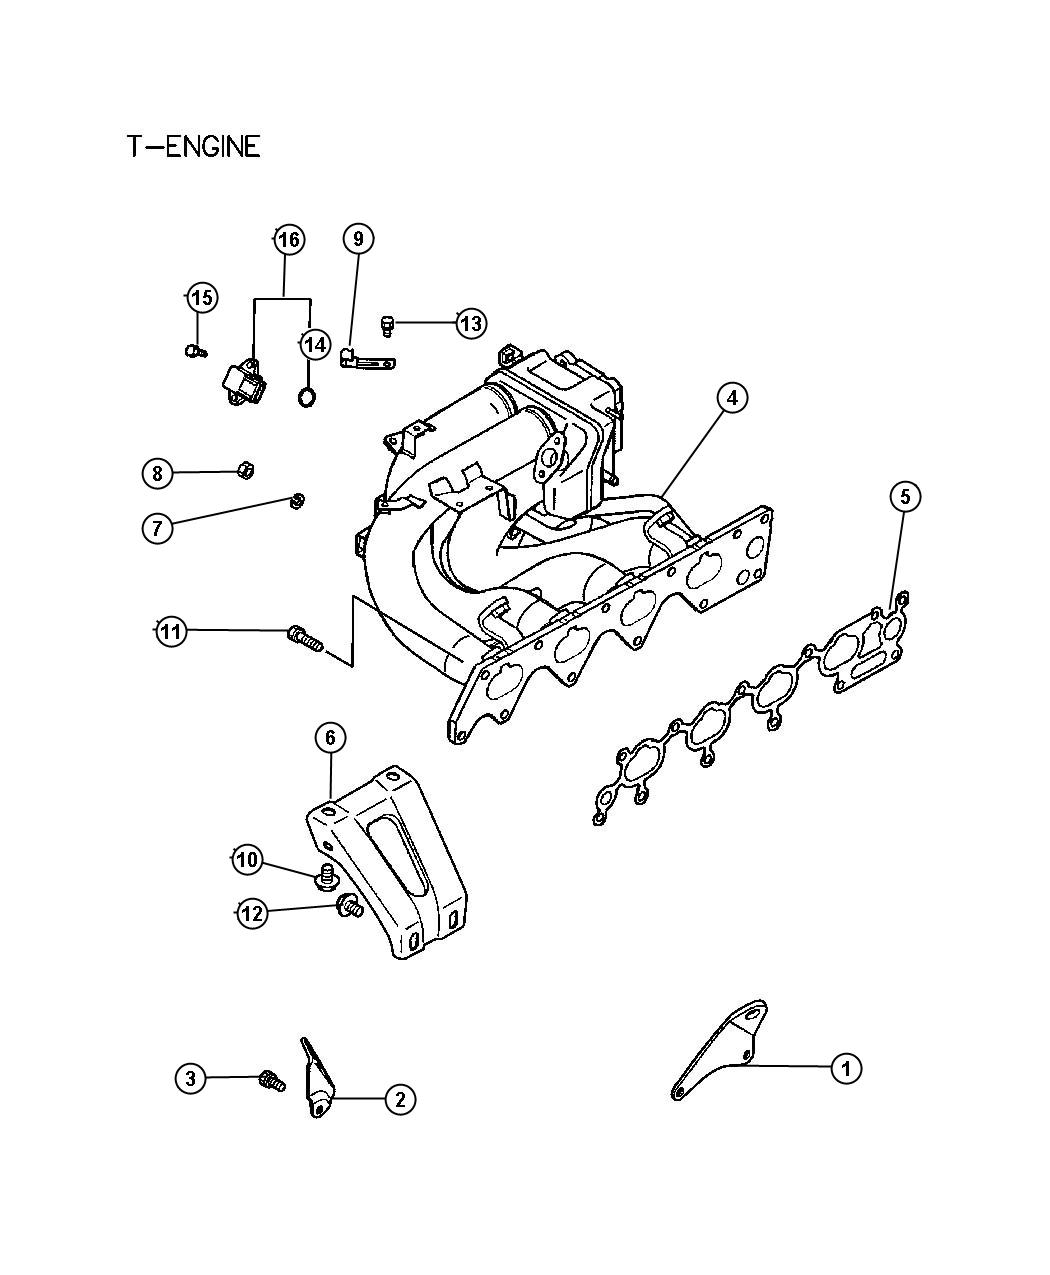 Dodge Stratus Bracket. Engine lift. Manifold, hanger